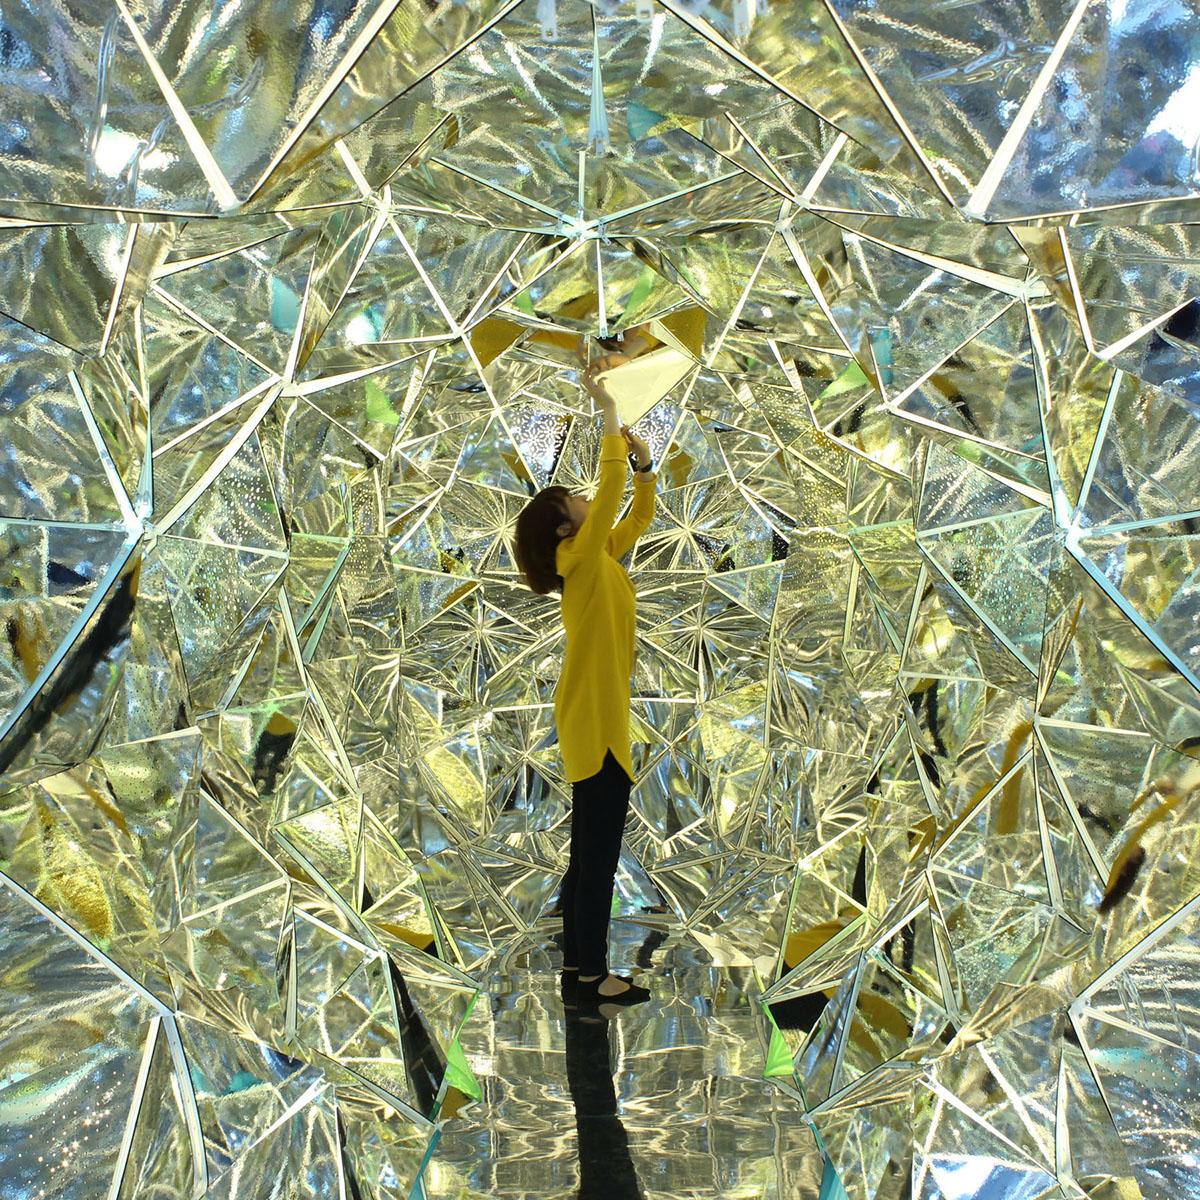 A Gigantic Kaleidoscope within a Shipping Container by Masakazu Shirane